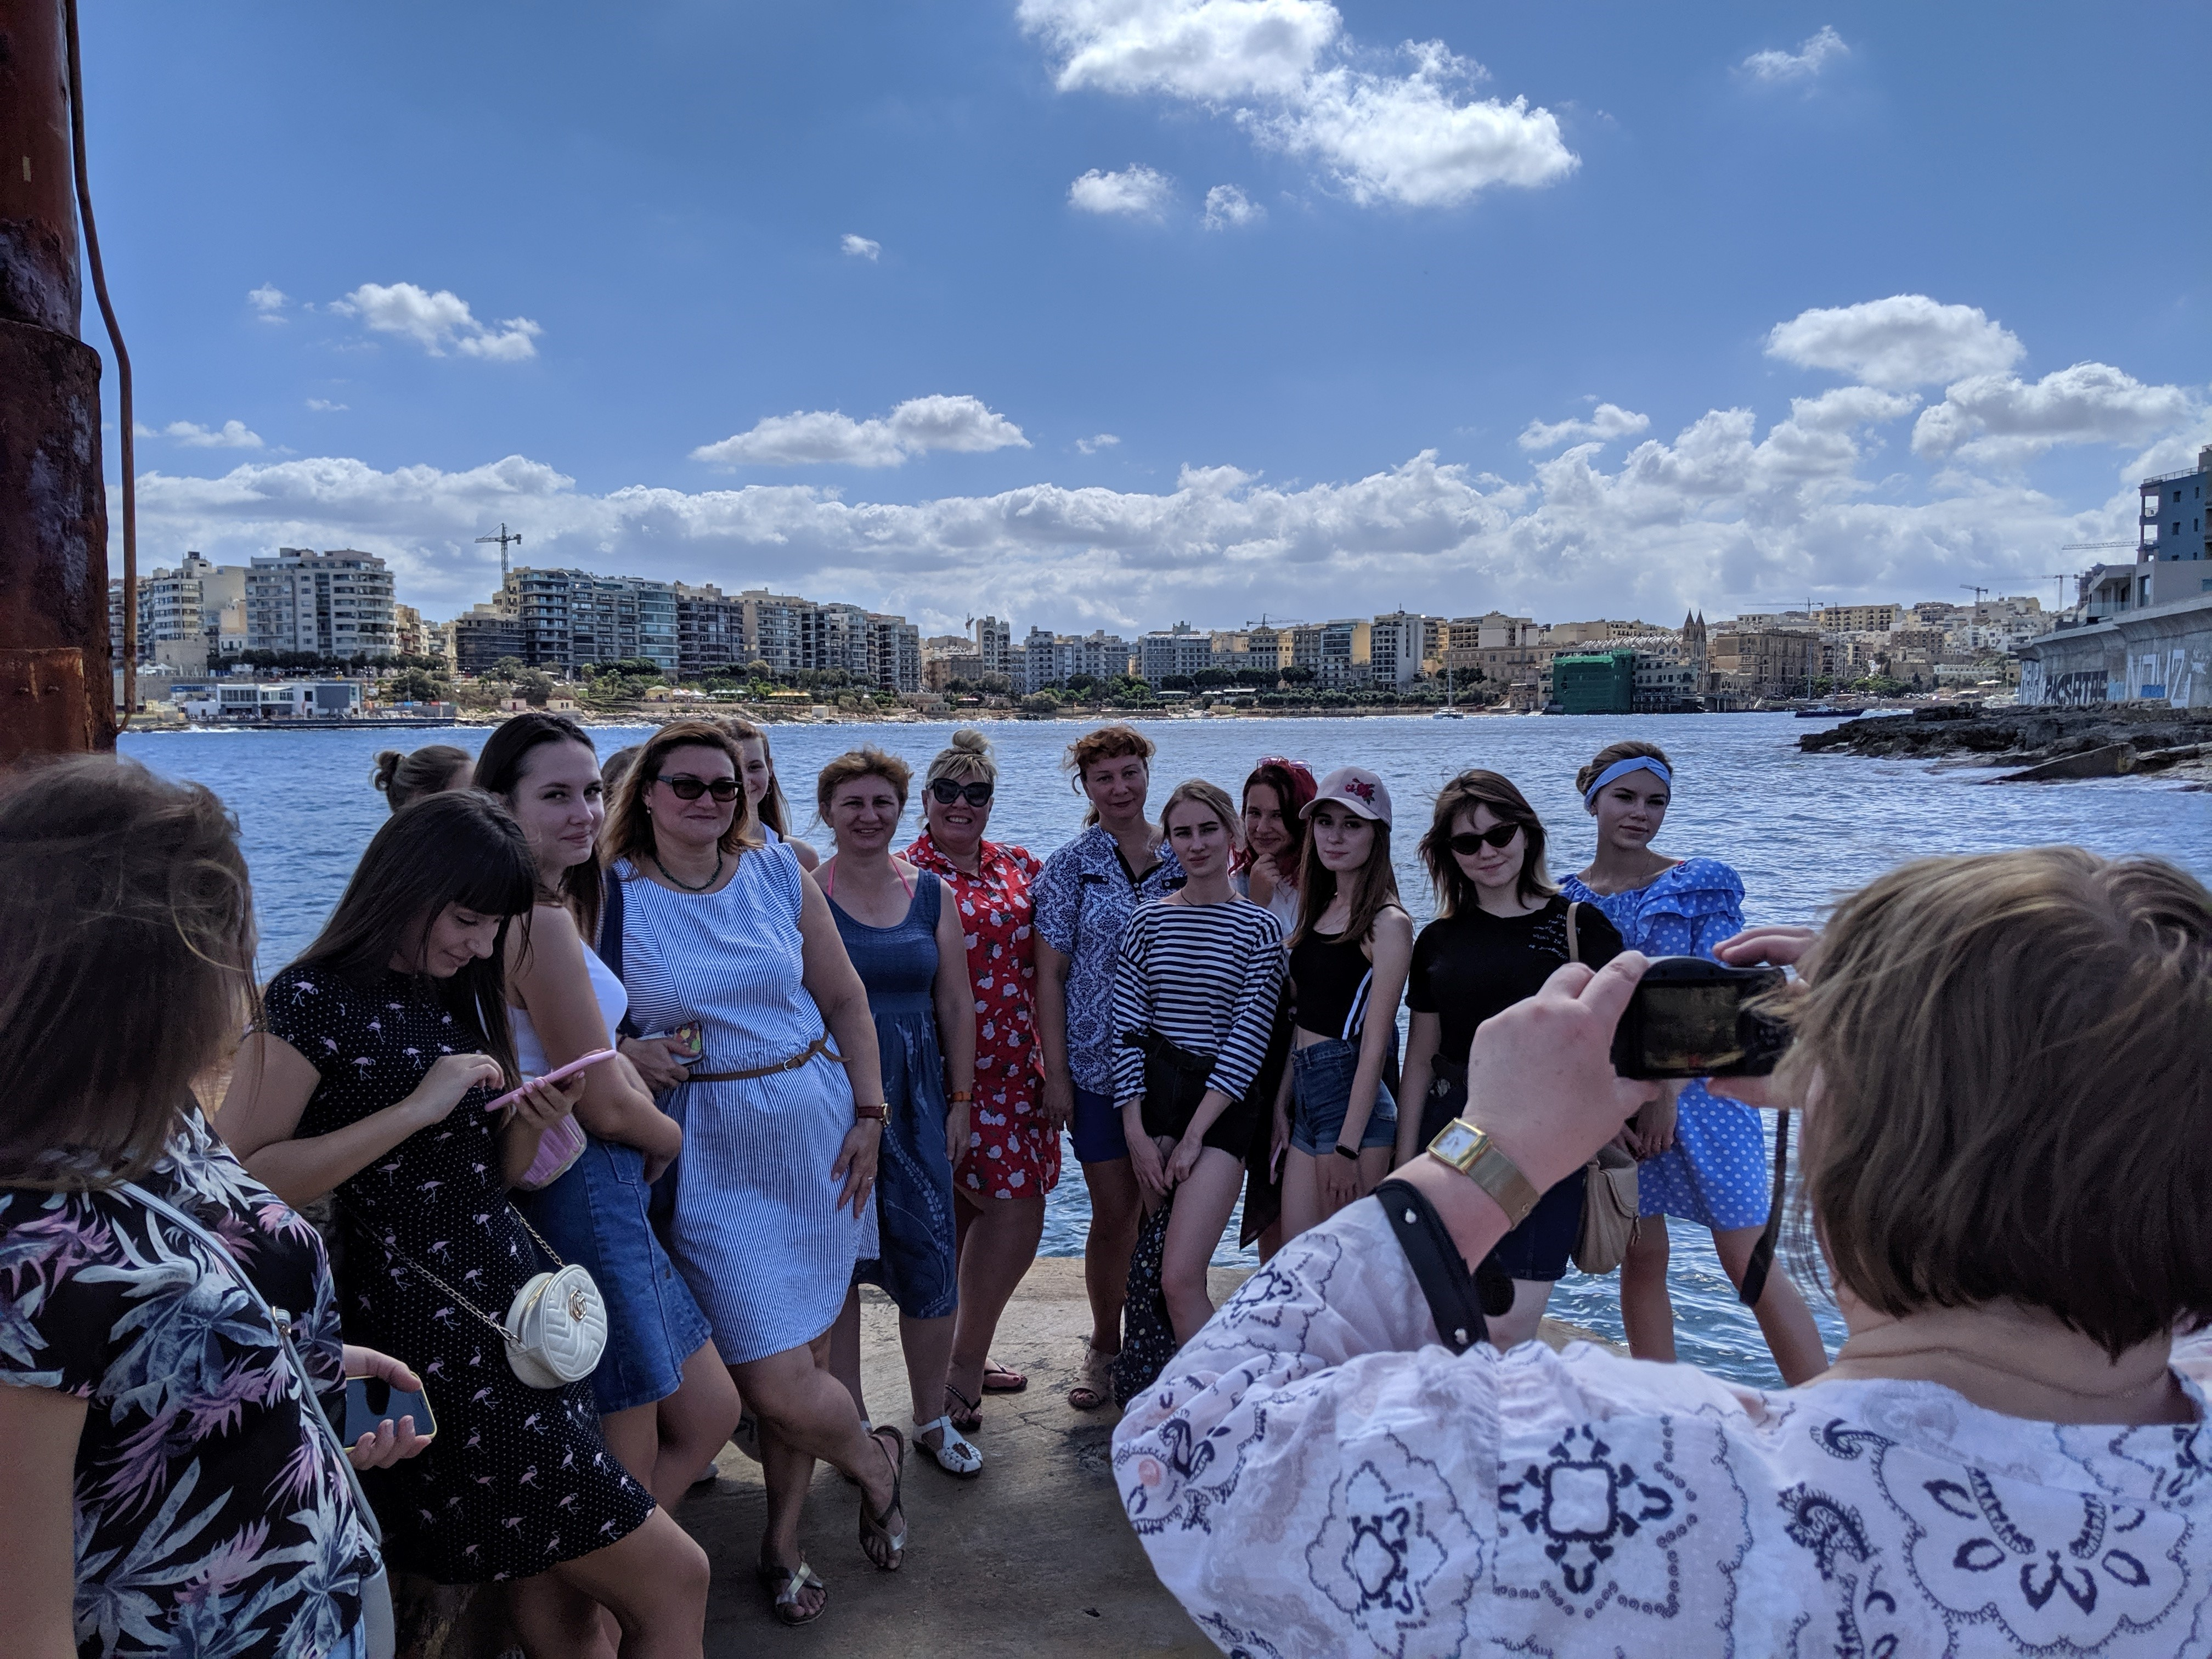 Study English in Malta - изучать английский на Мальте в школе Gateway St Julians